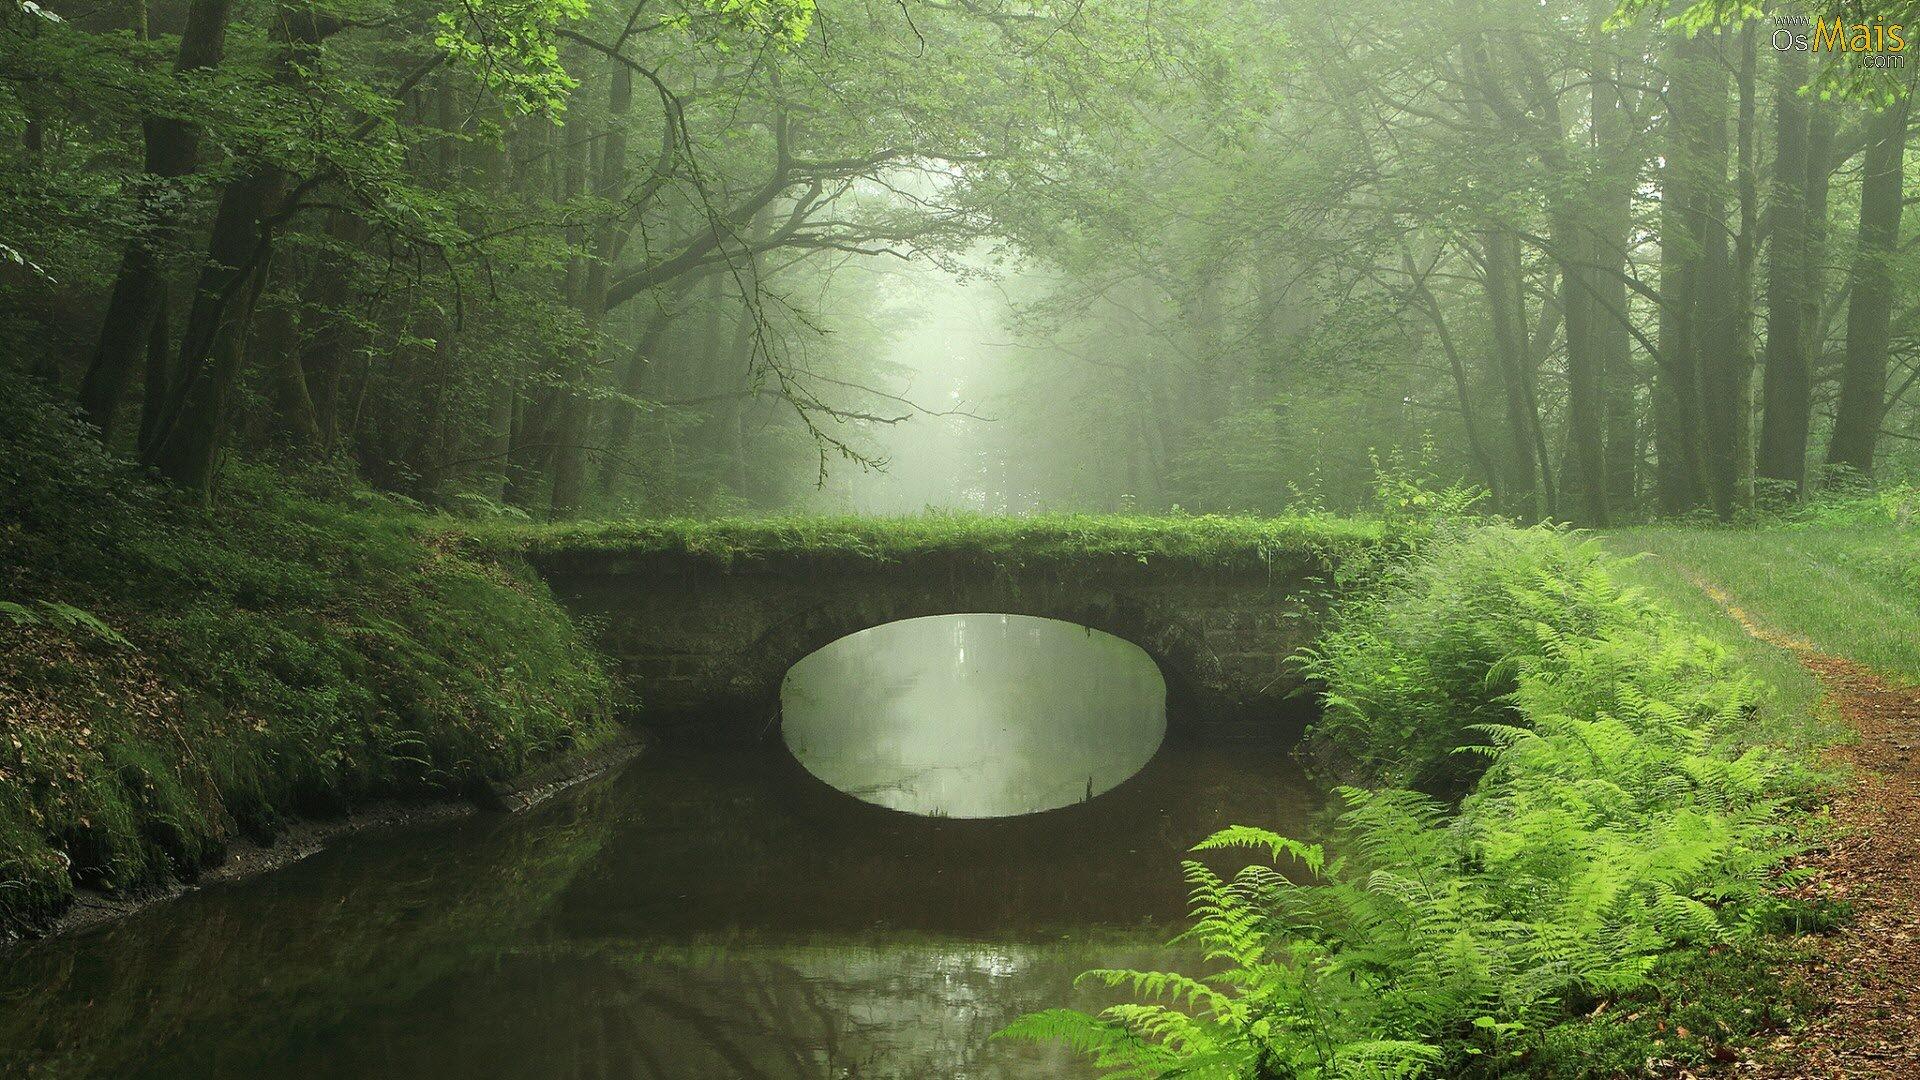 [ Teste Chunnin ] Robb Ponte-floresta-nevoa-wallpaper